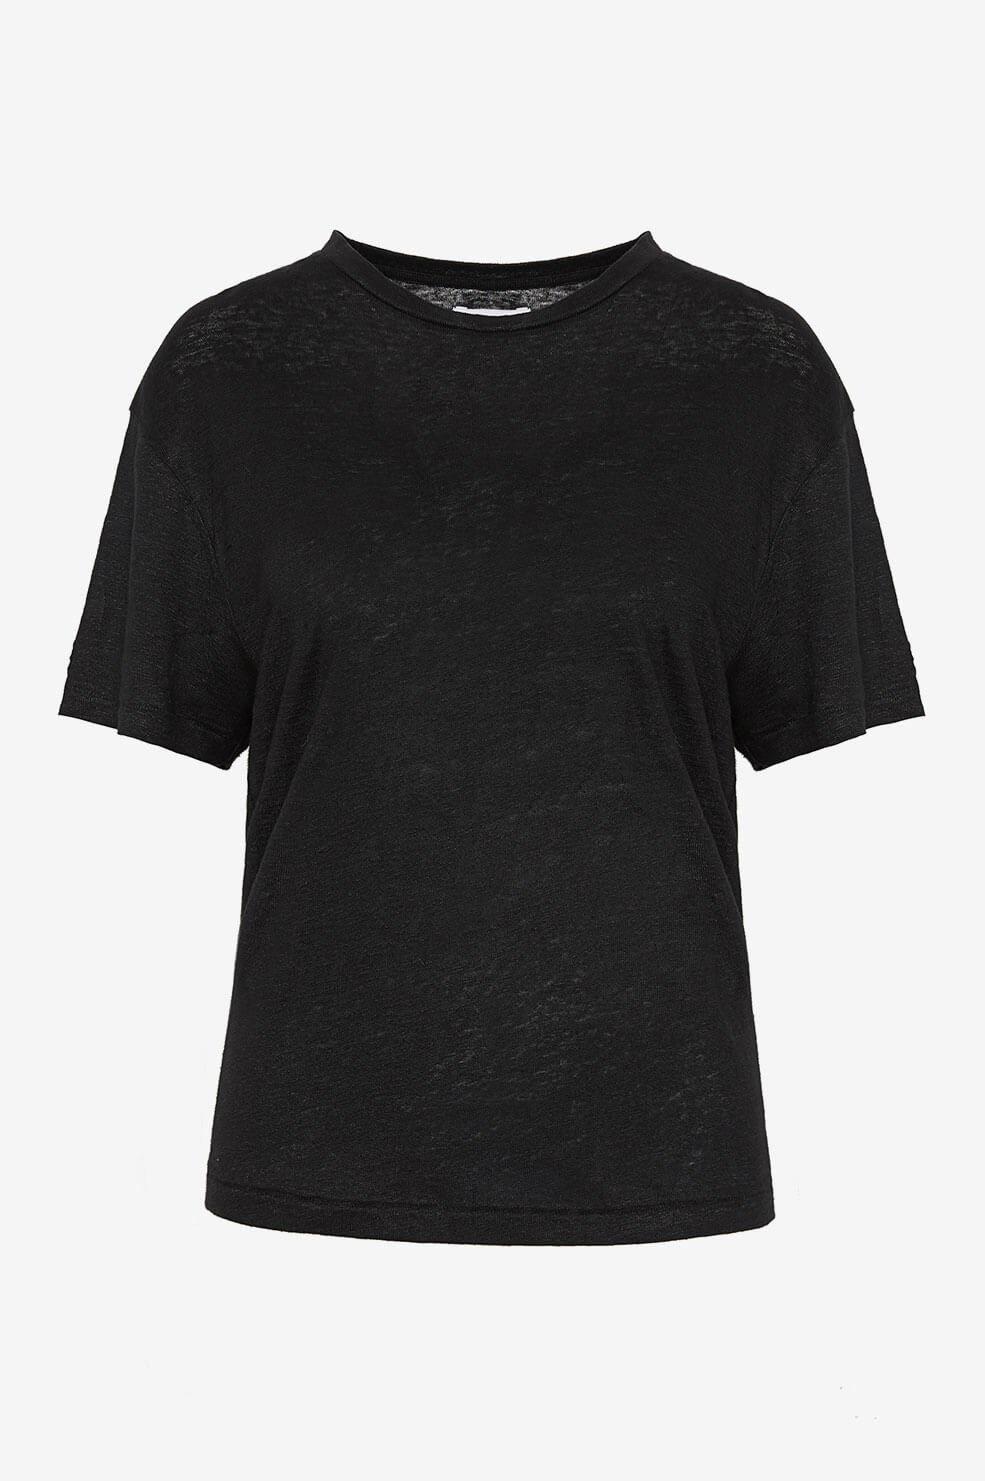 ANINE BING t shirt harper noir-4